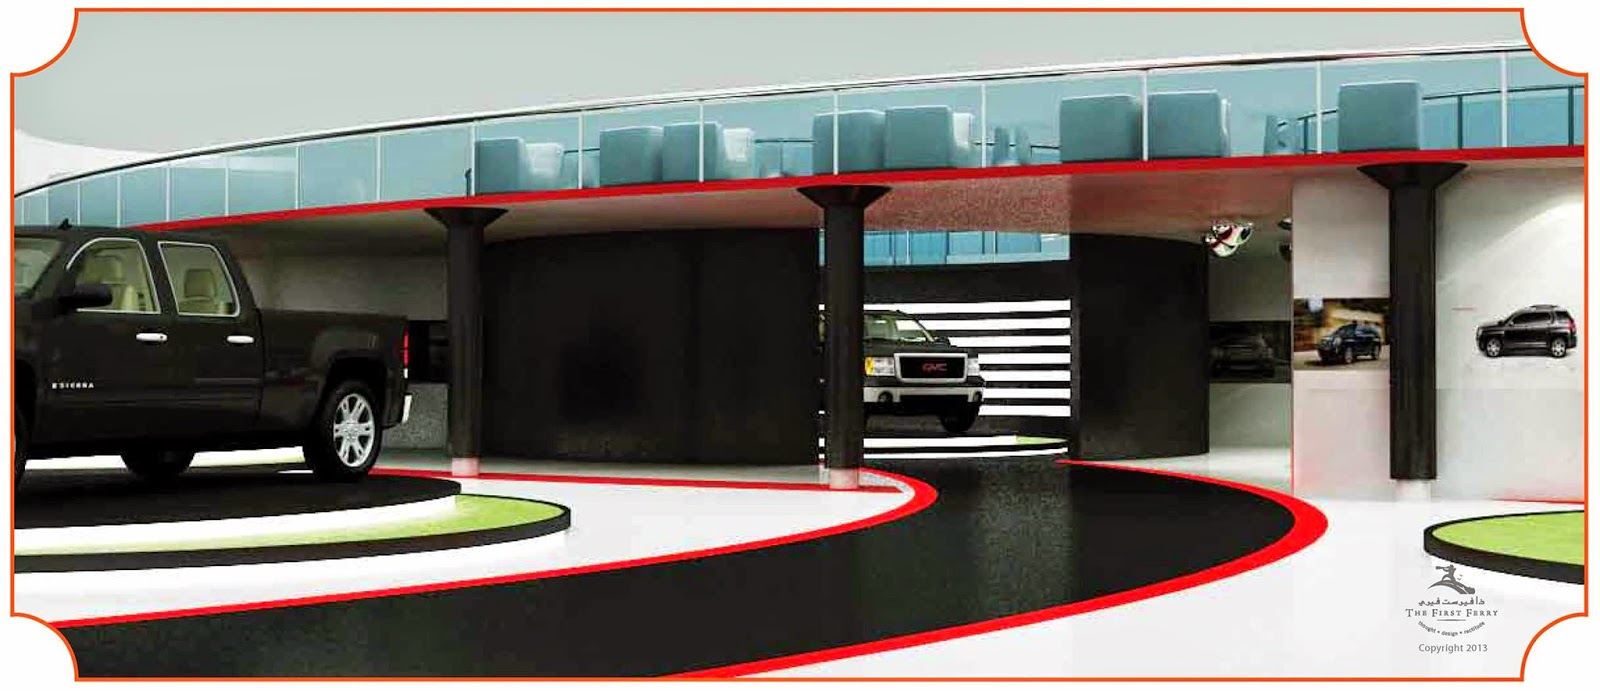 Exhibition Design Concept